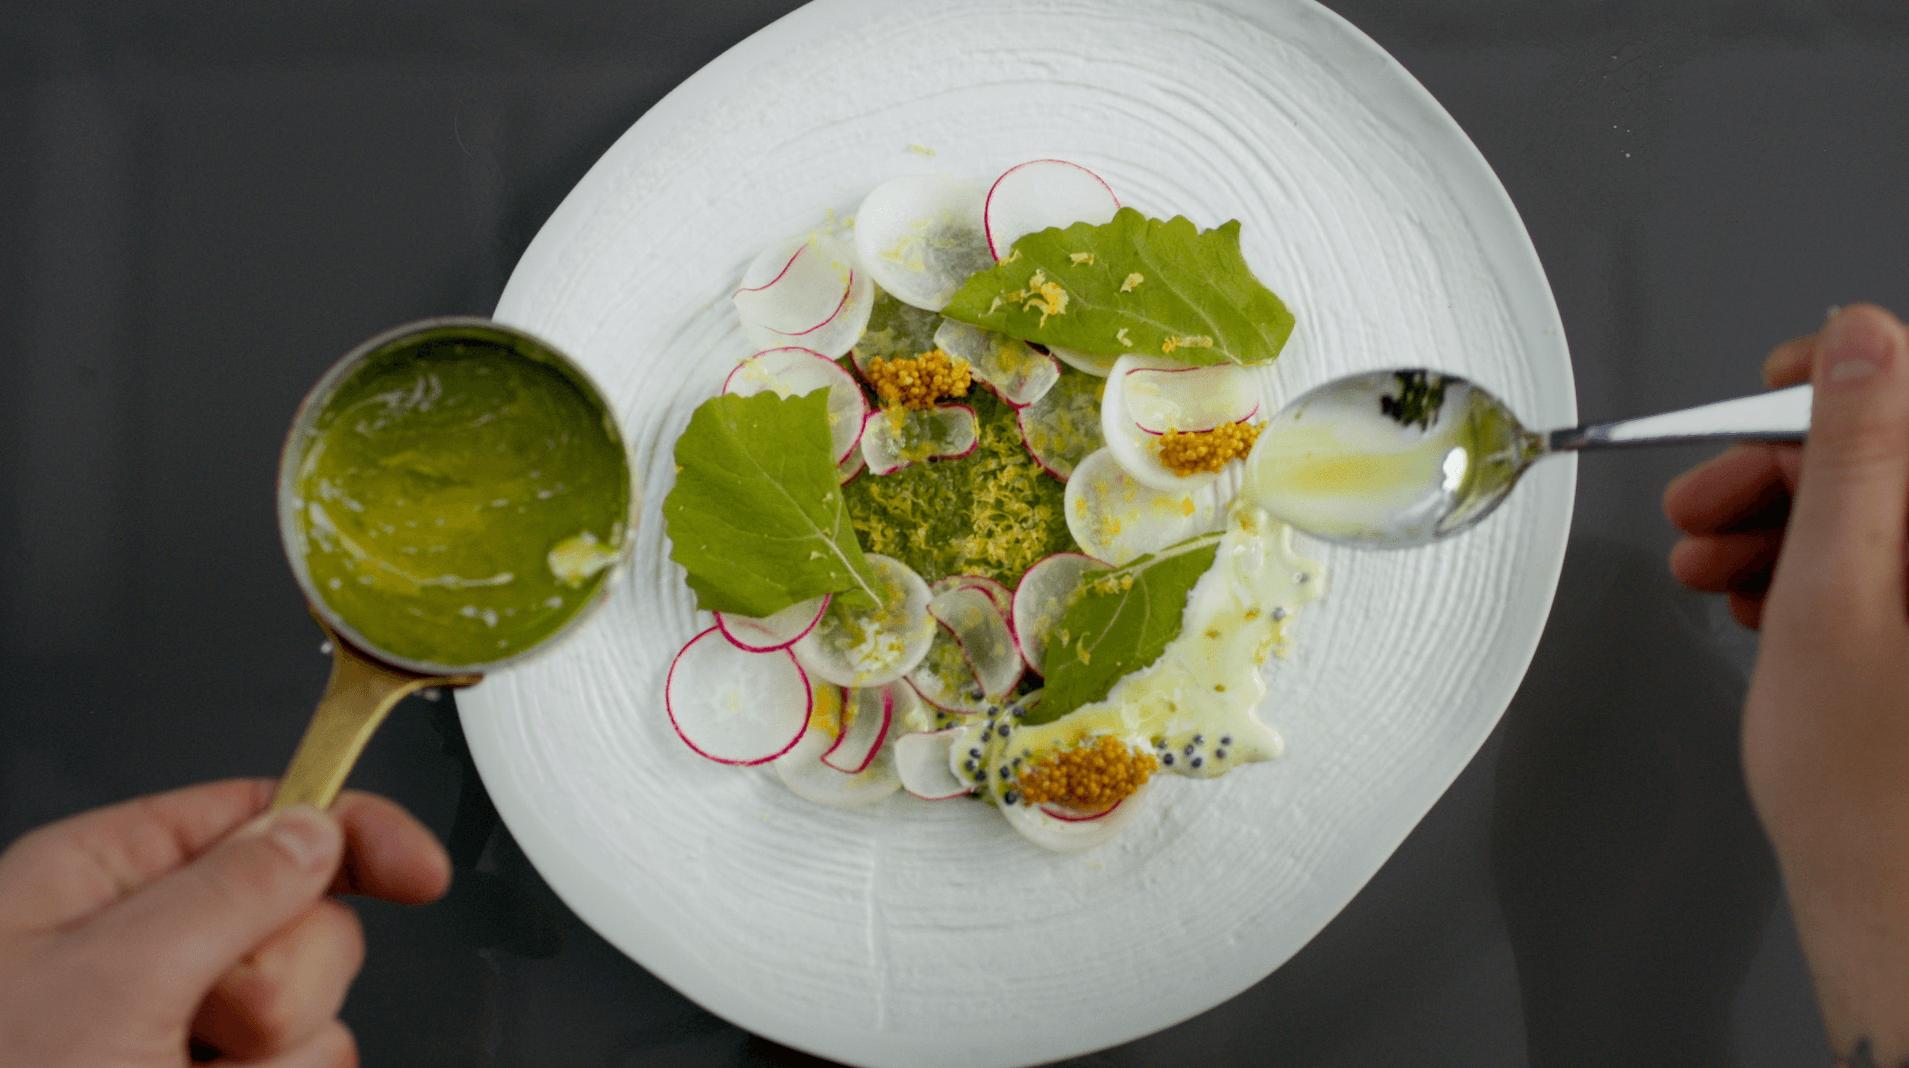 Culinary / Food Demo Reel